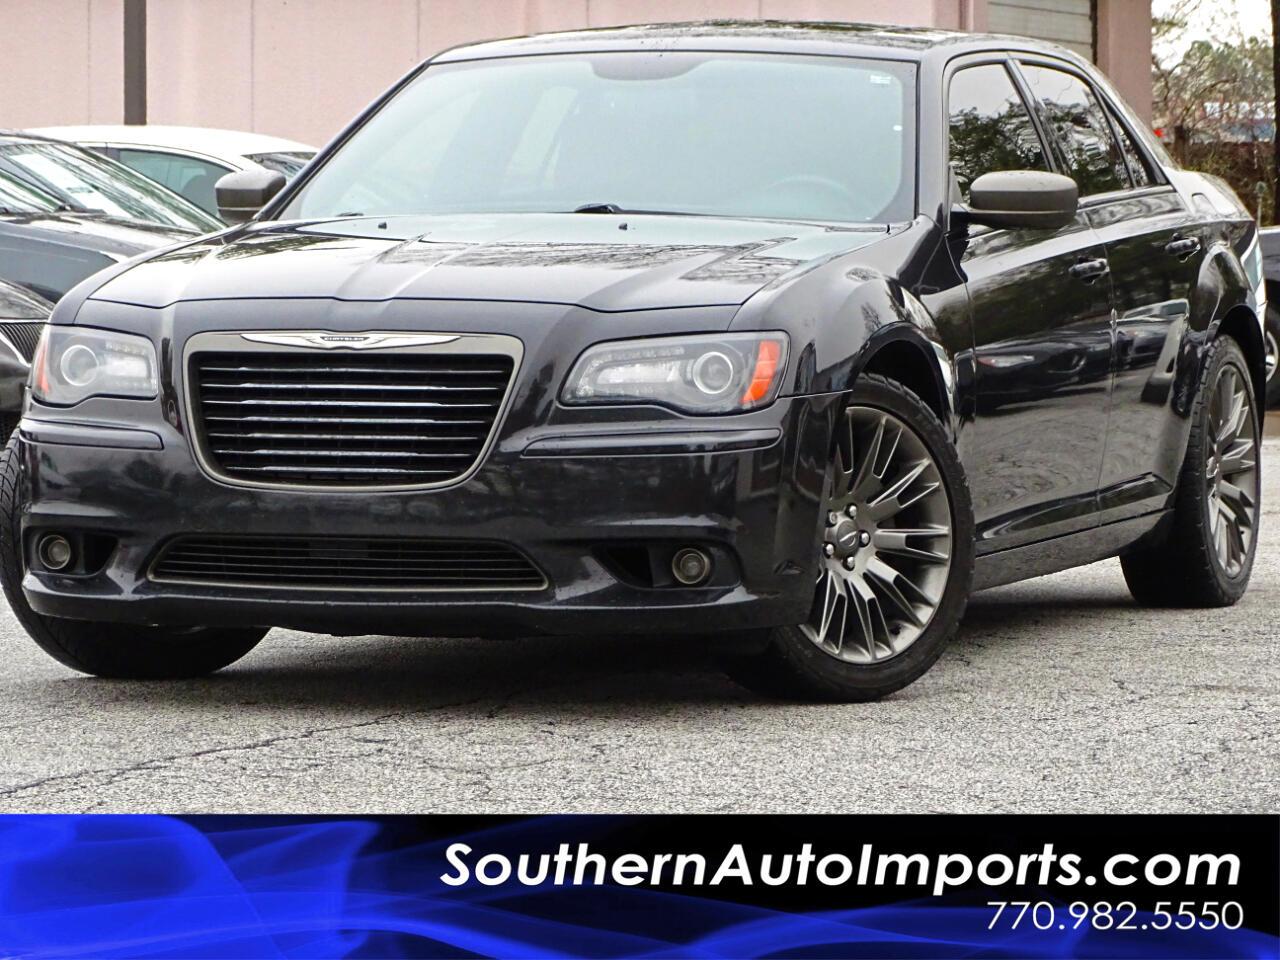 2014 Chrysler 300 4dr Sdn 300C John Varvatos Limited Edition RWD